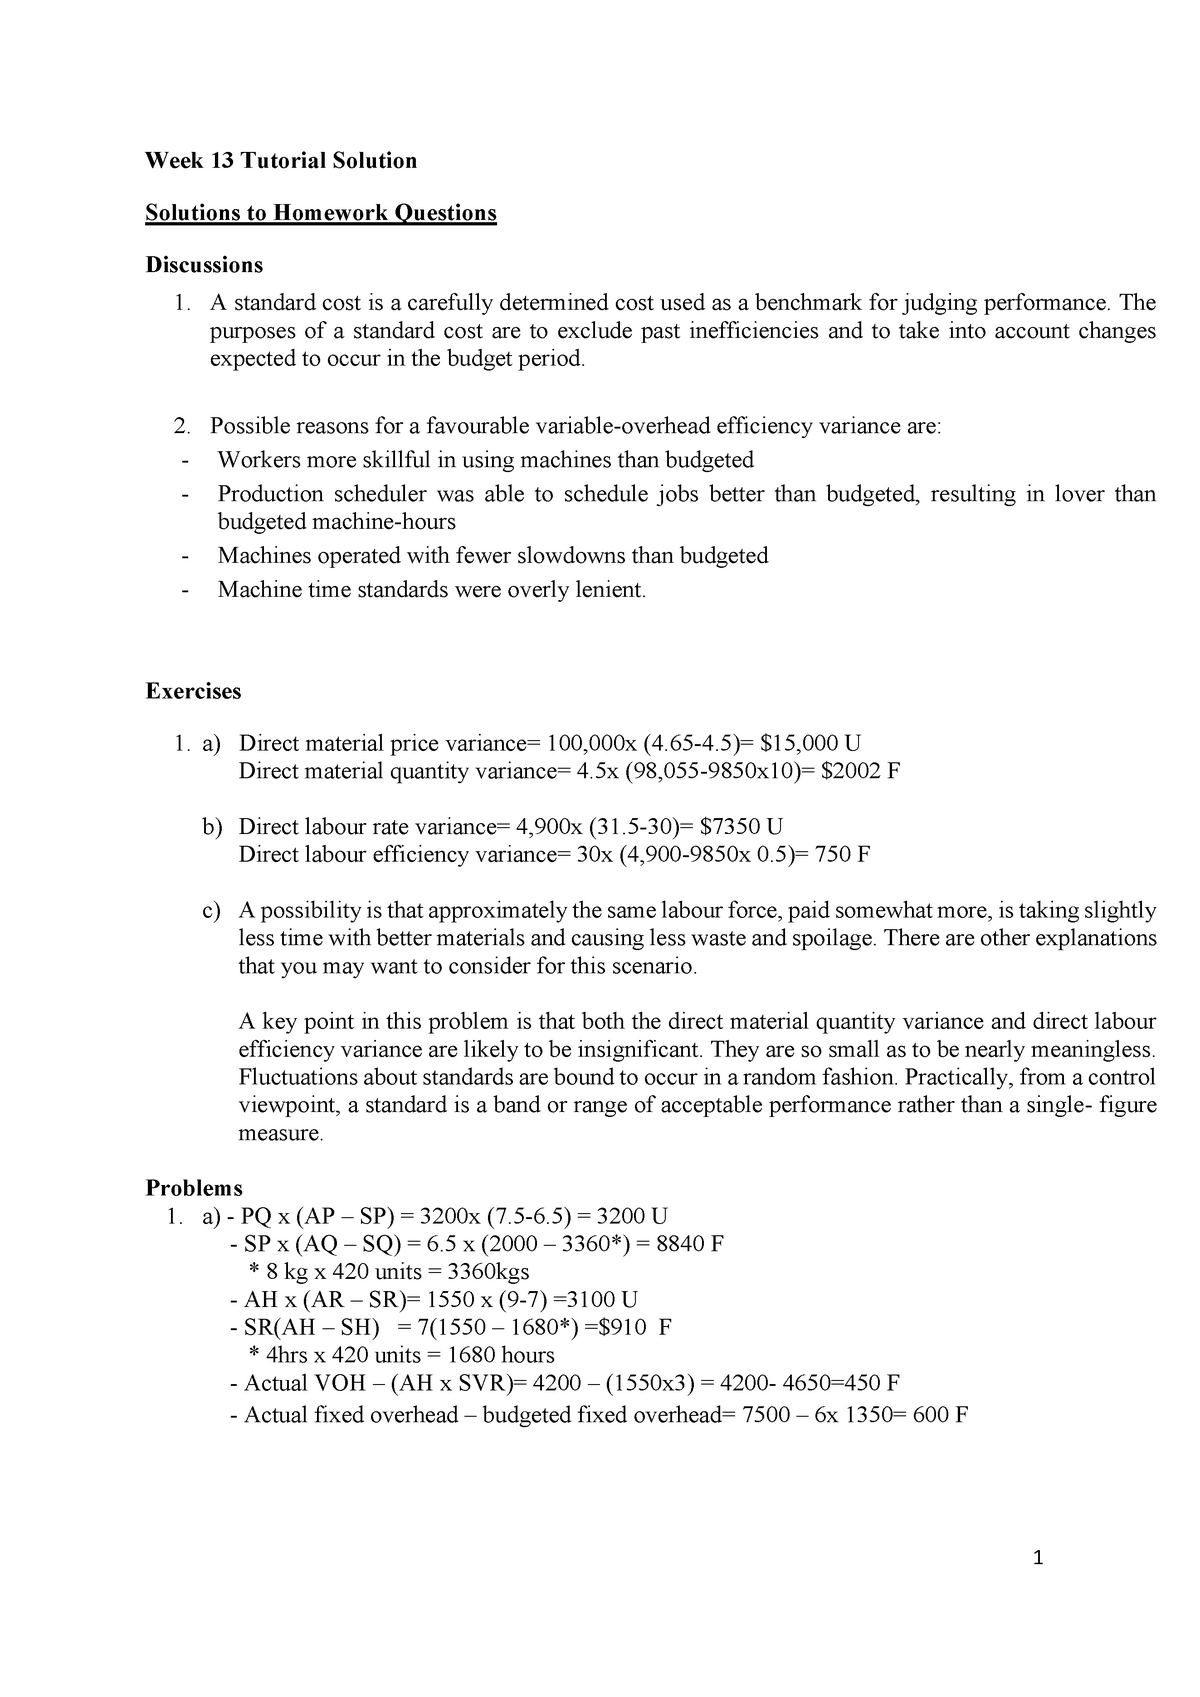 Week 13 Tutorial Solutions - ACCG200: Fundamentals of